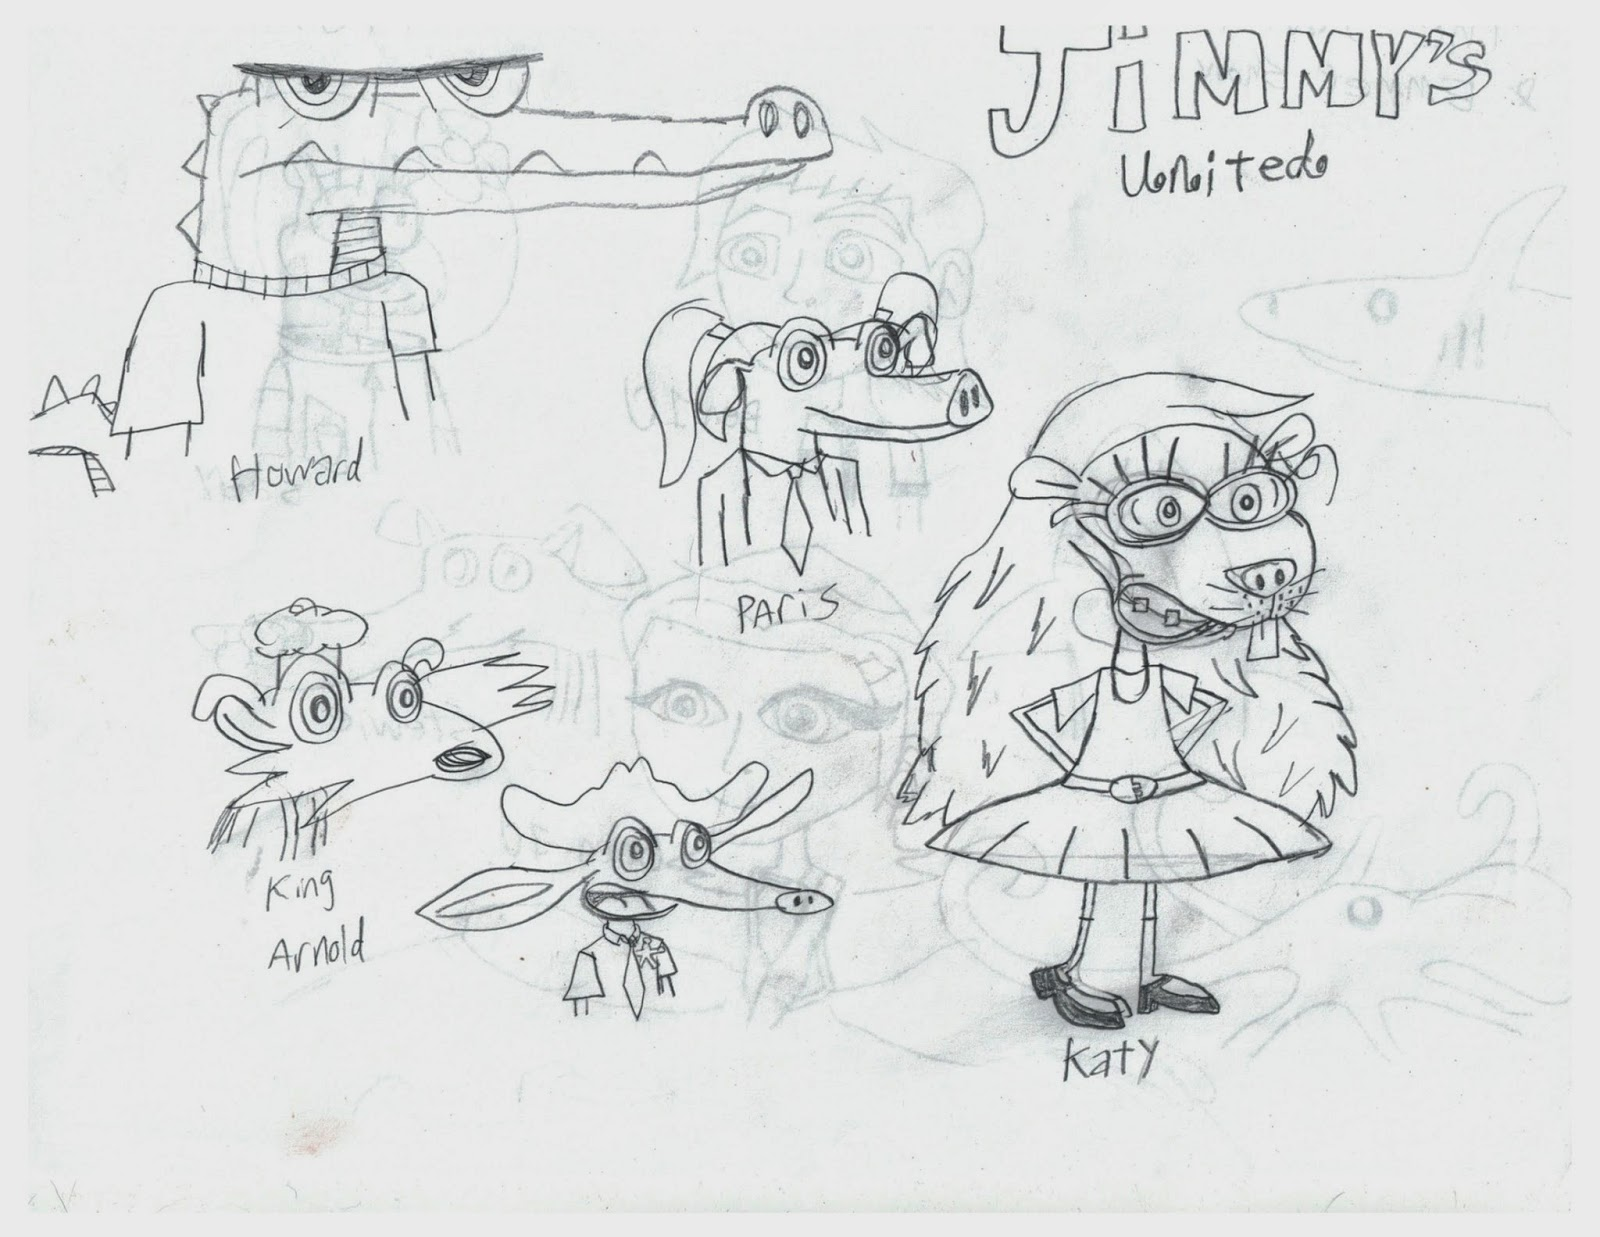 Emmet Paul: New jimmy characters